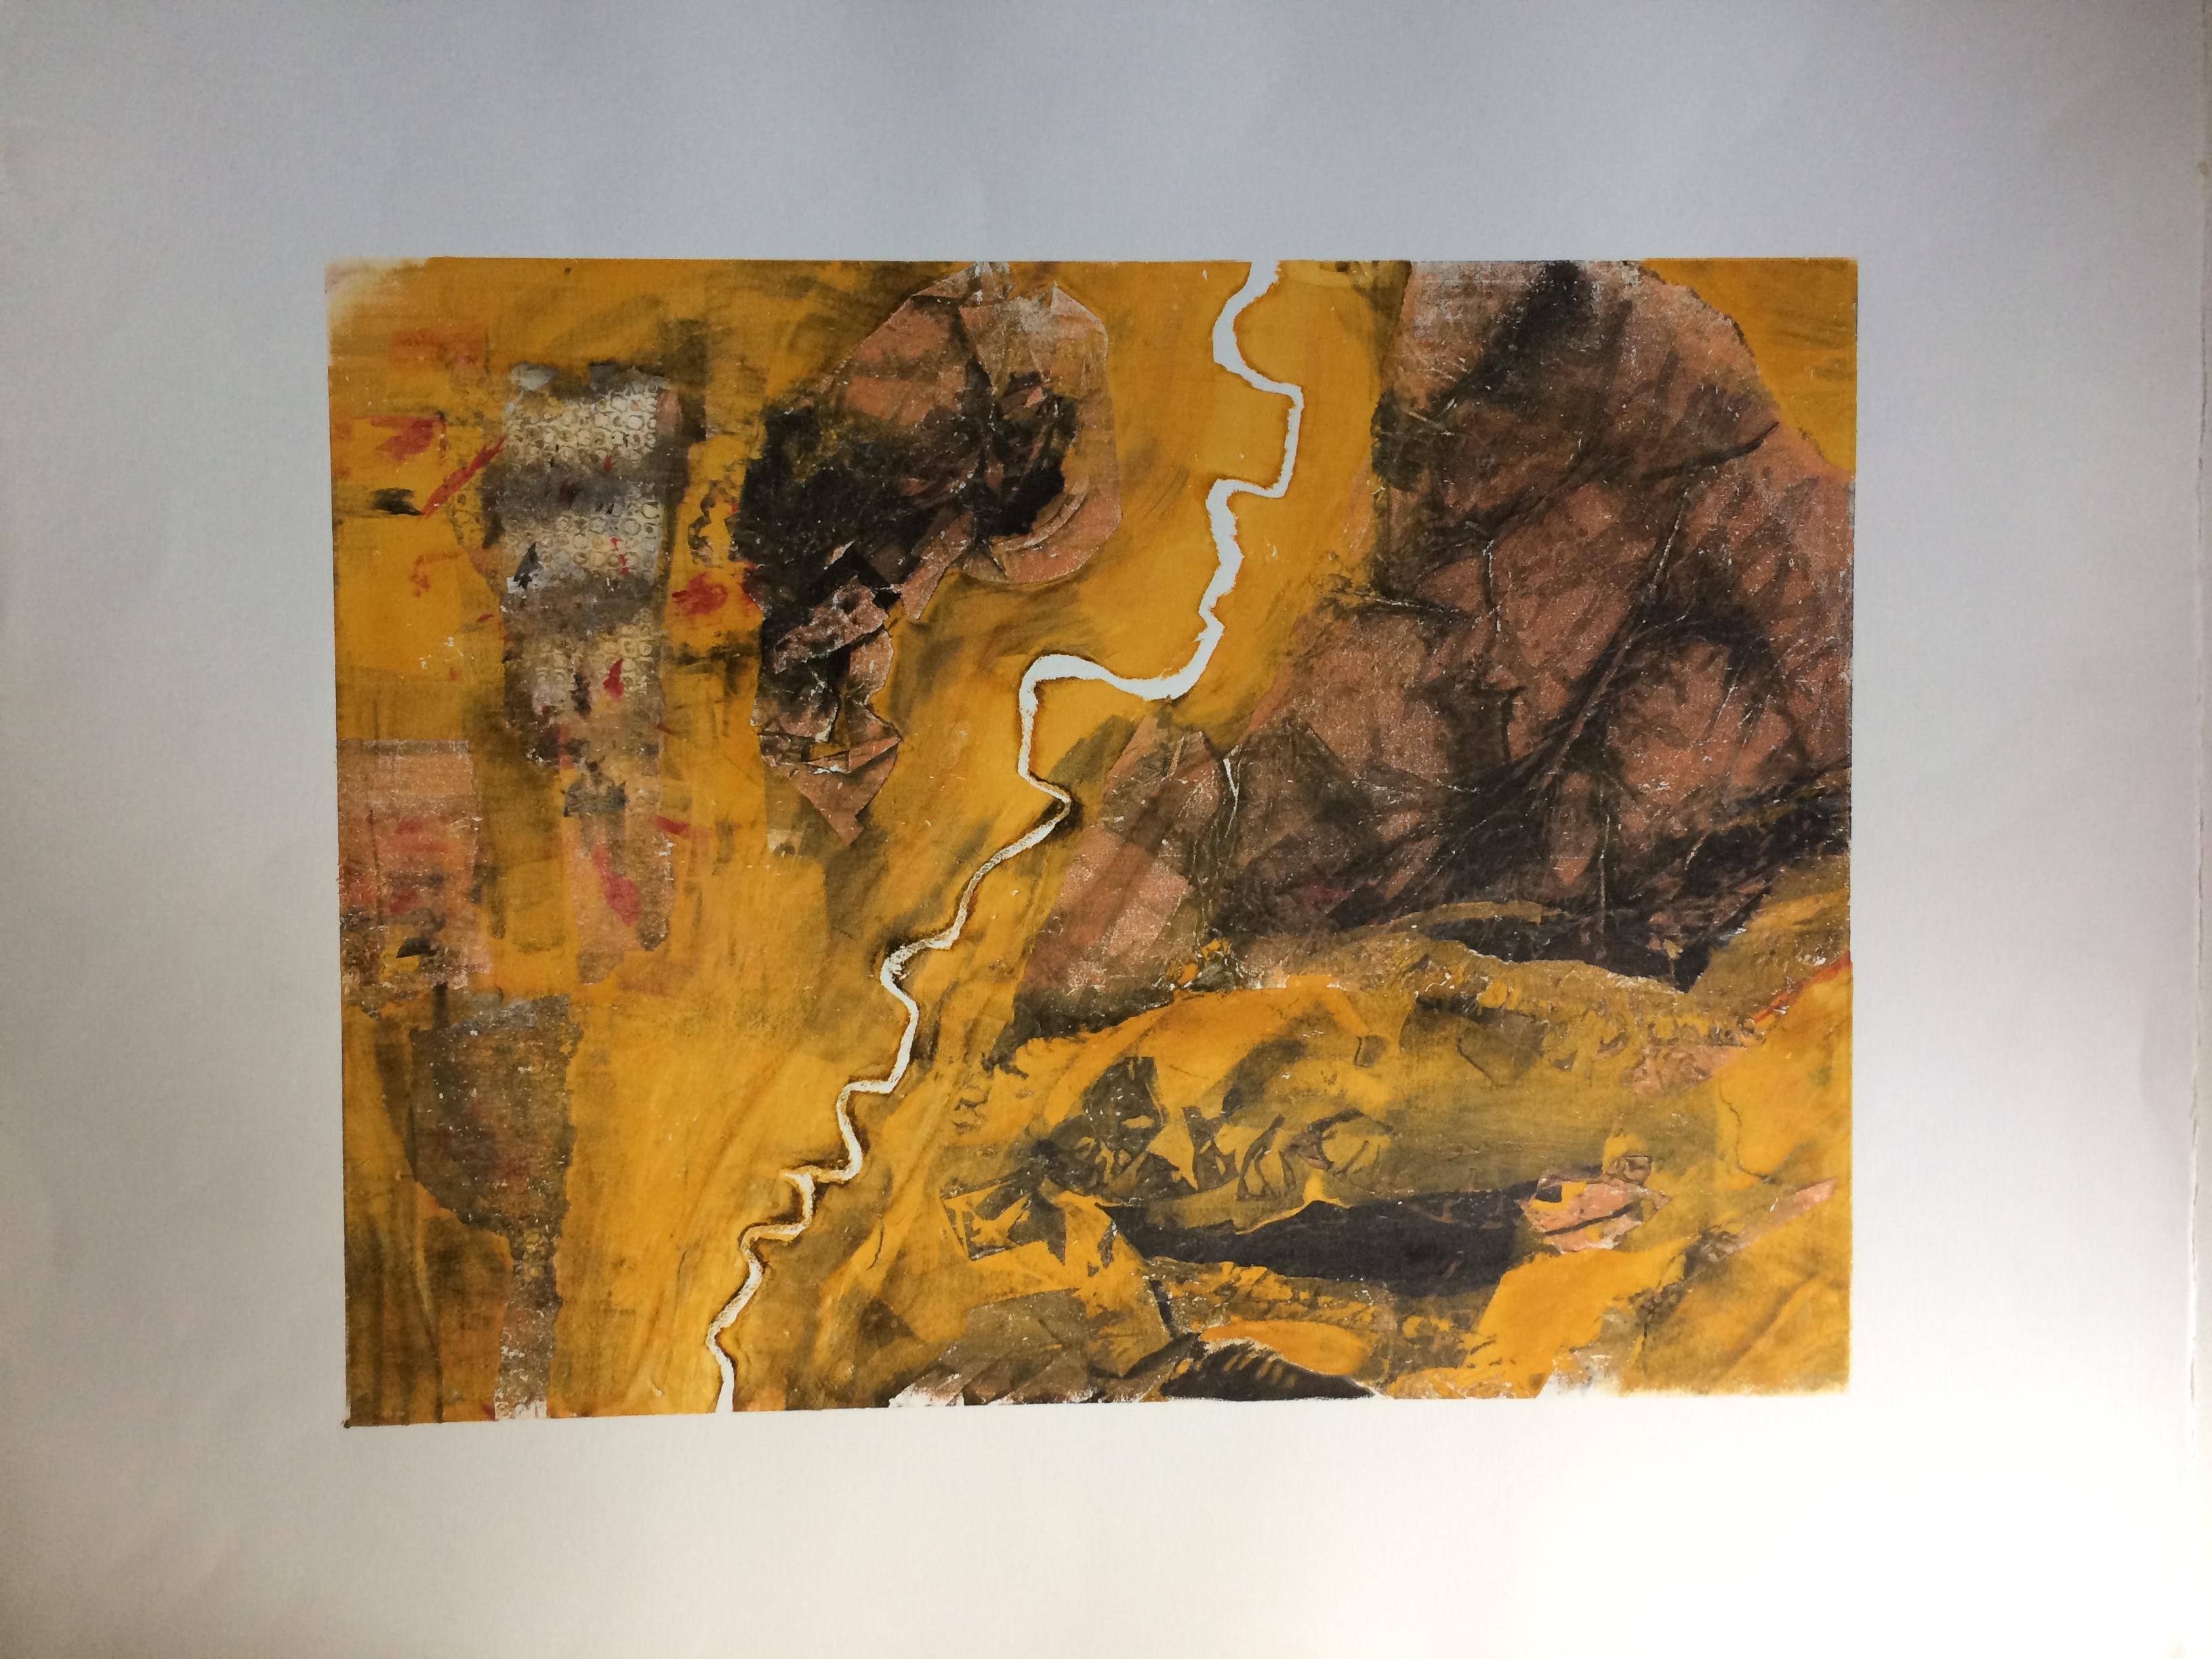 055 Monoprint 45 x 34